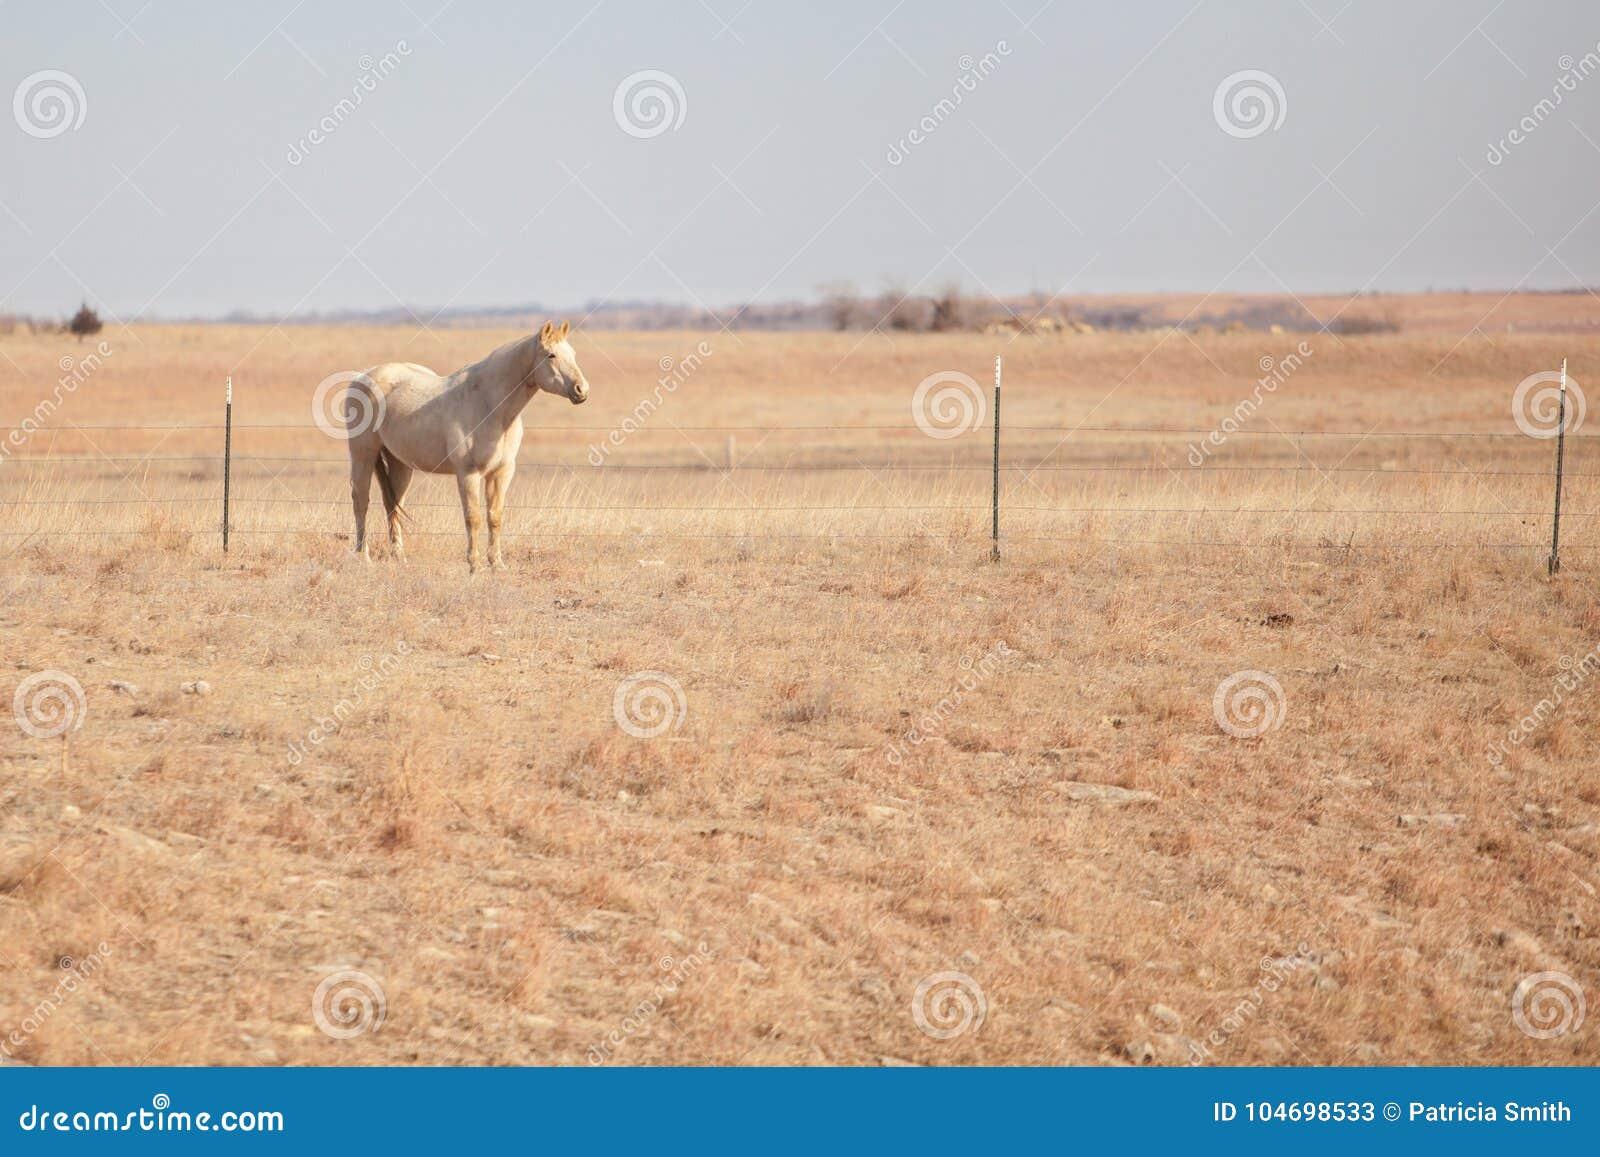 Lone Palomino horse in field